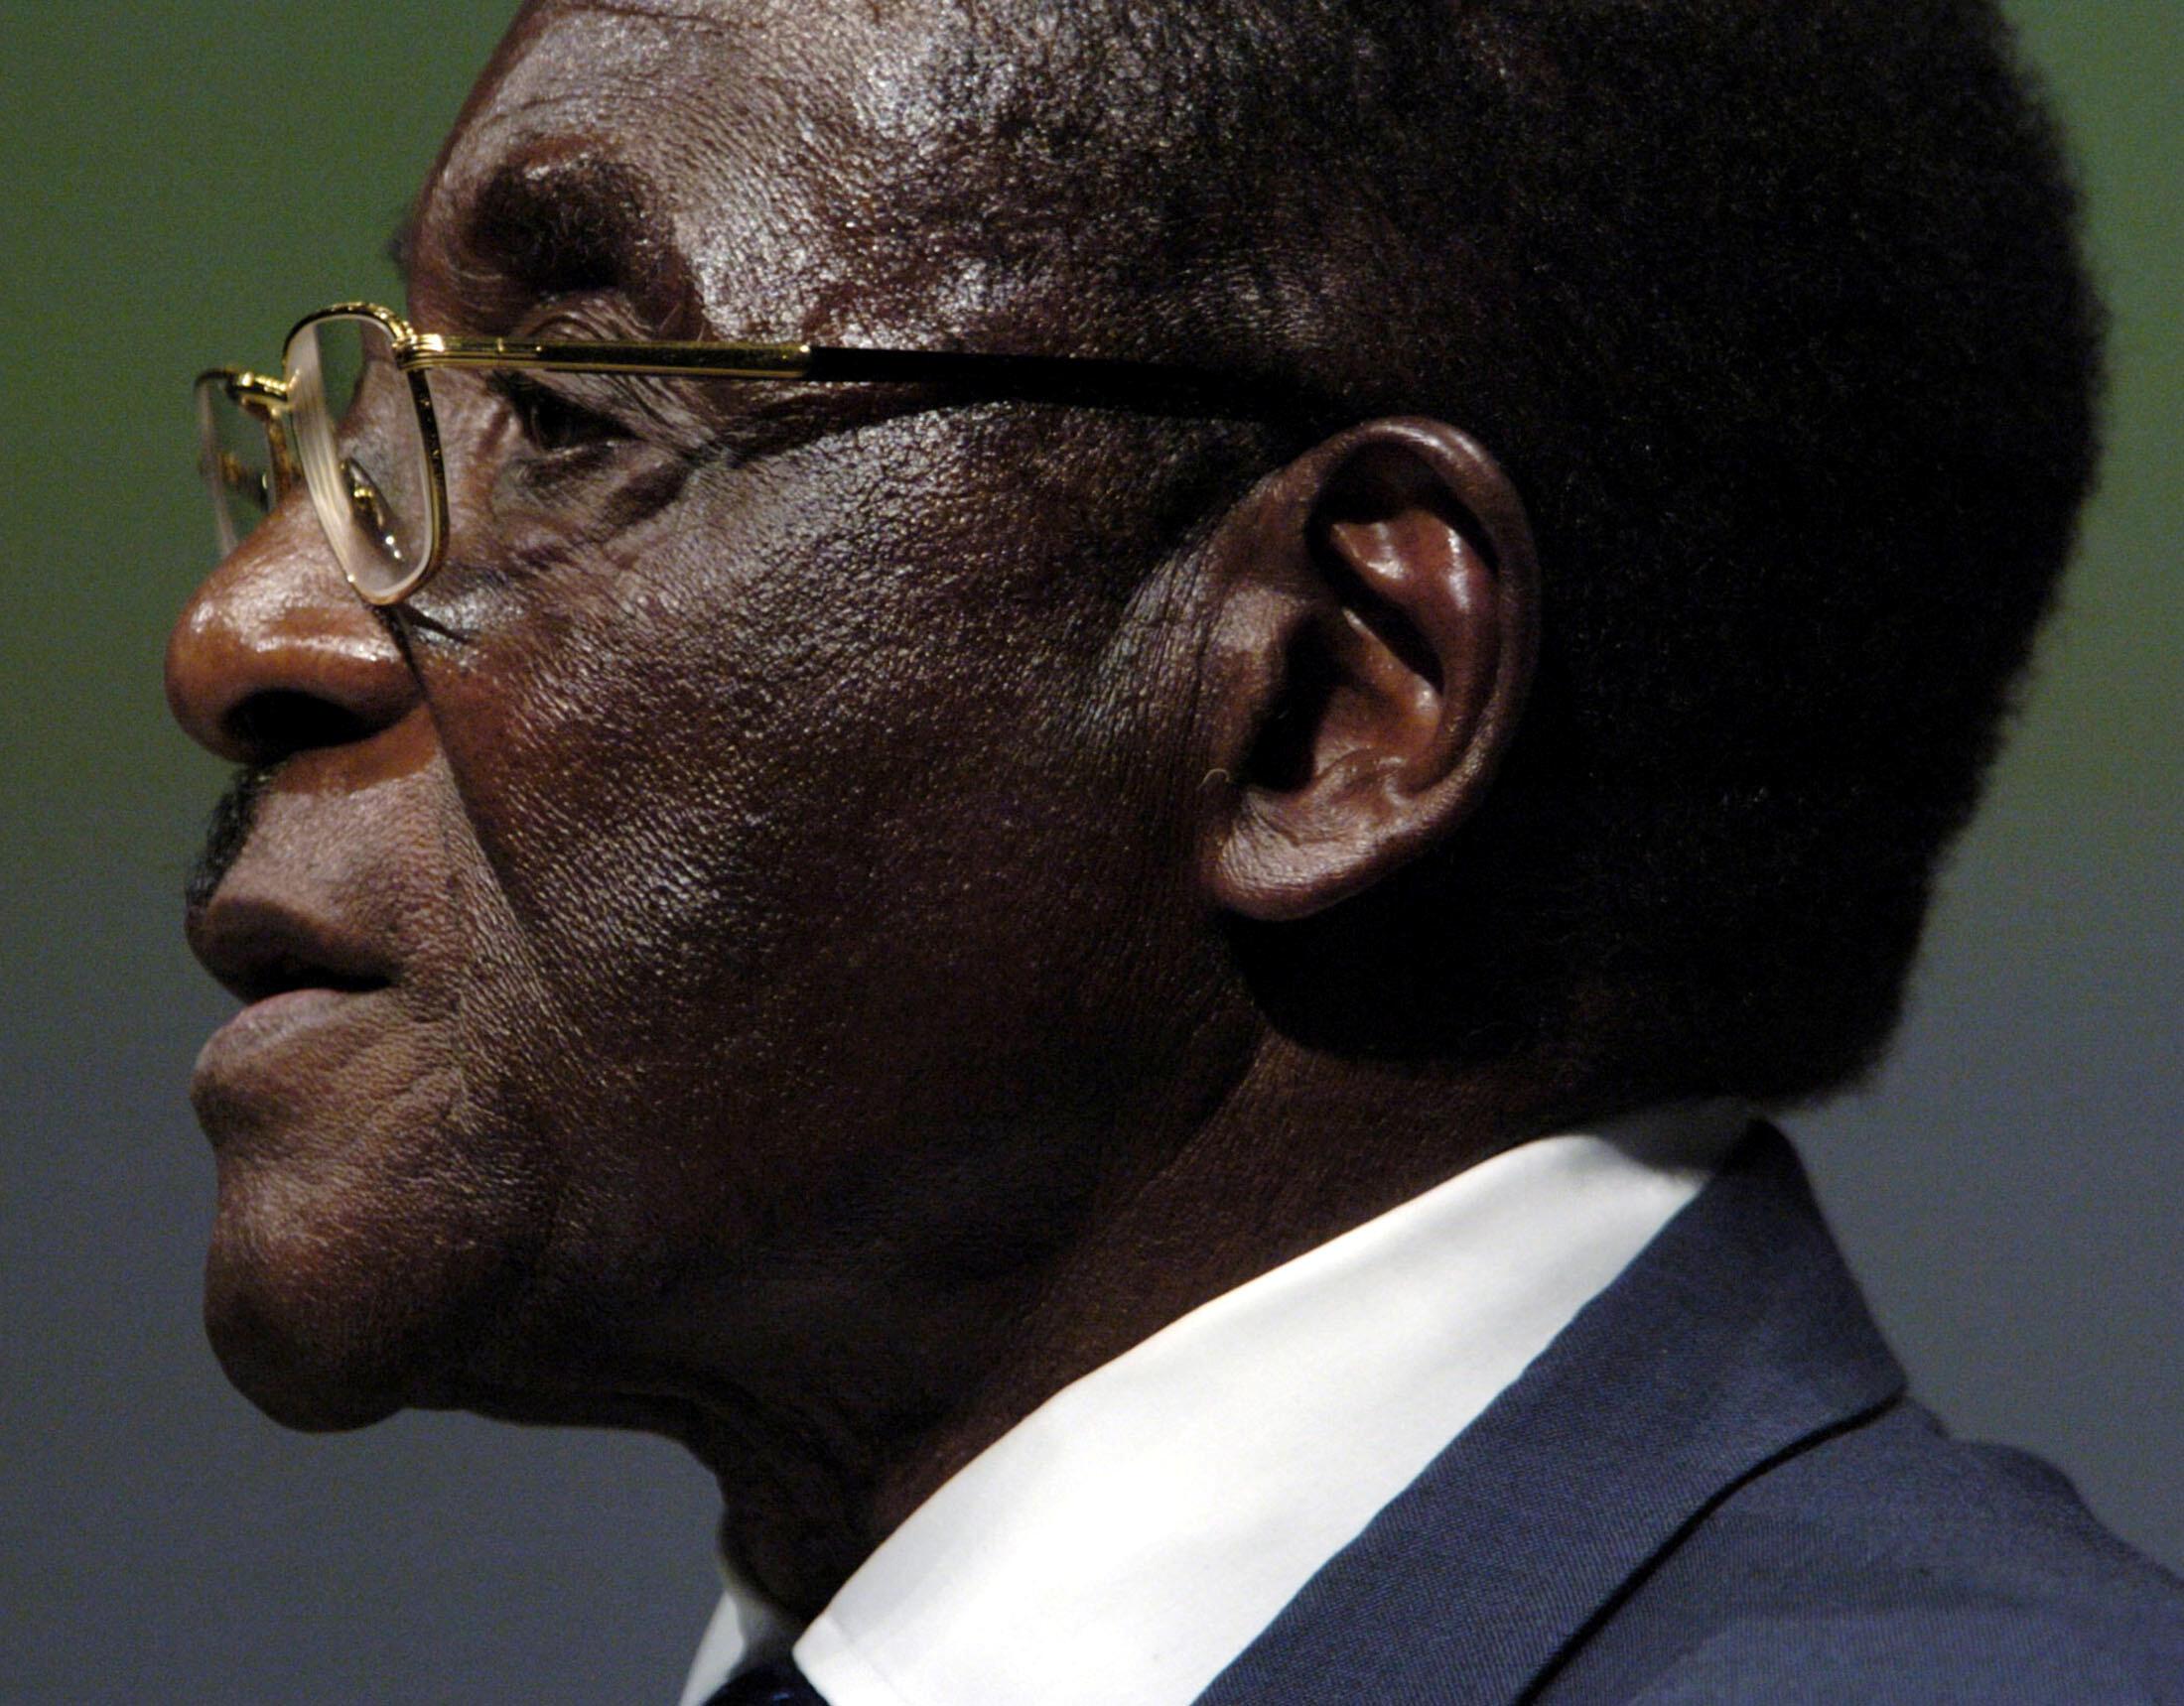 FILE PHOTO: Zimbabwean President Robert Mugabe addresses the Inaugural Session of the World Summit On Information Society in Geneva, Switzerland December 10, 2003.